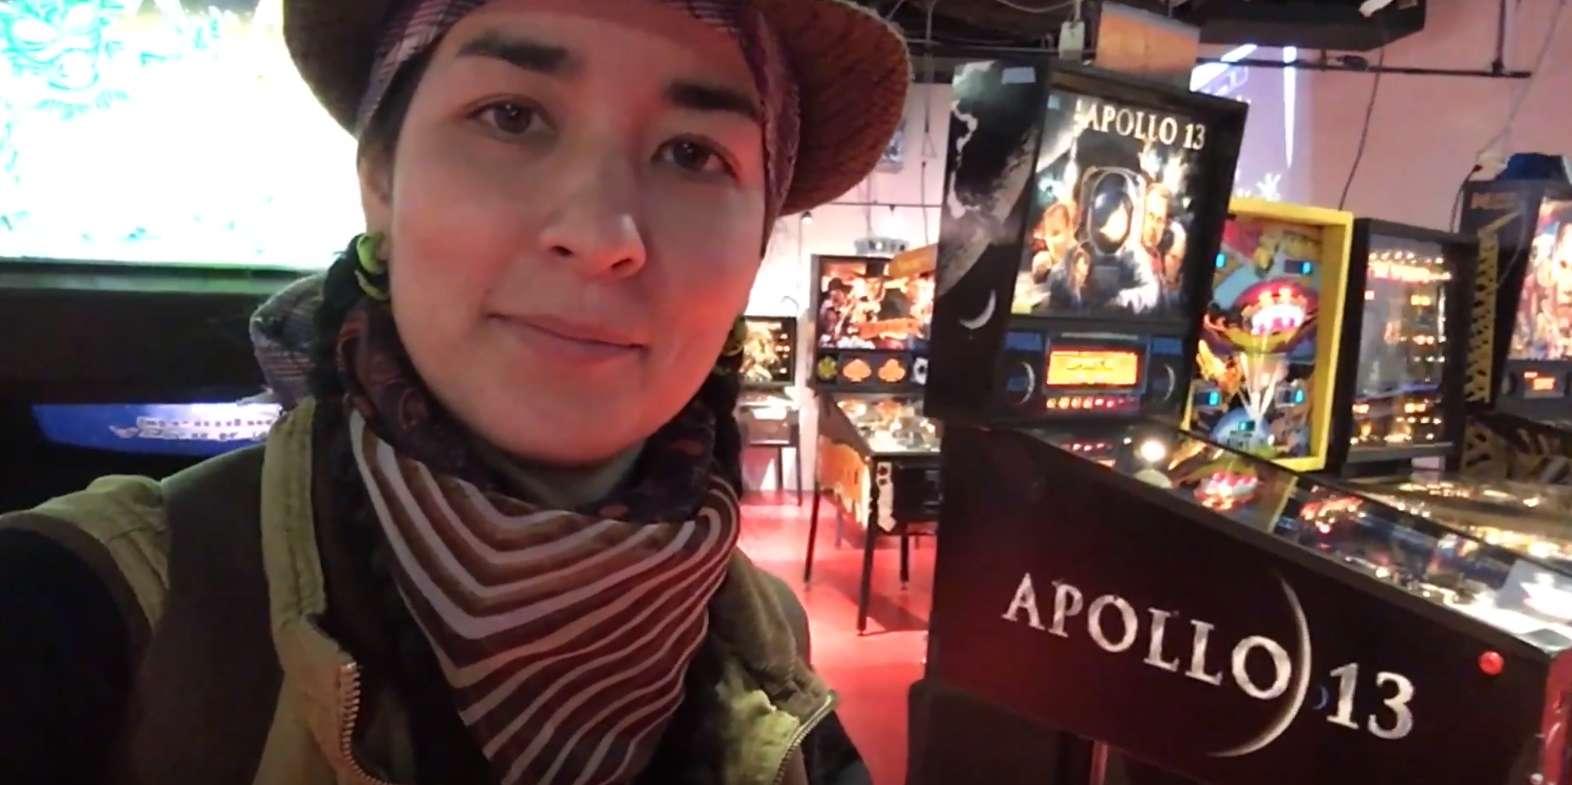 Imoto visits The Silver Ball Planet – Osaka, Japan